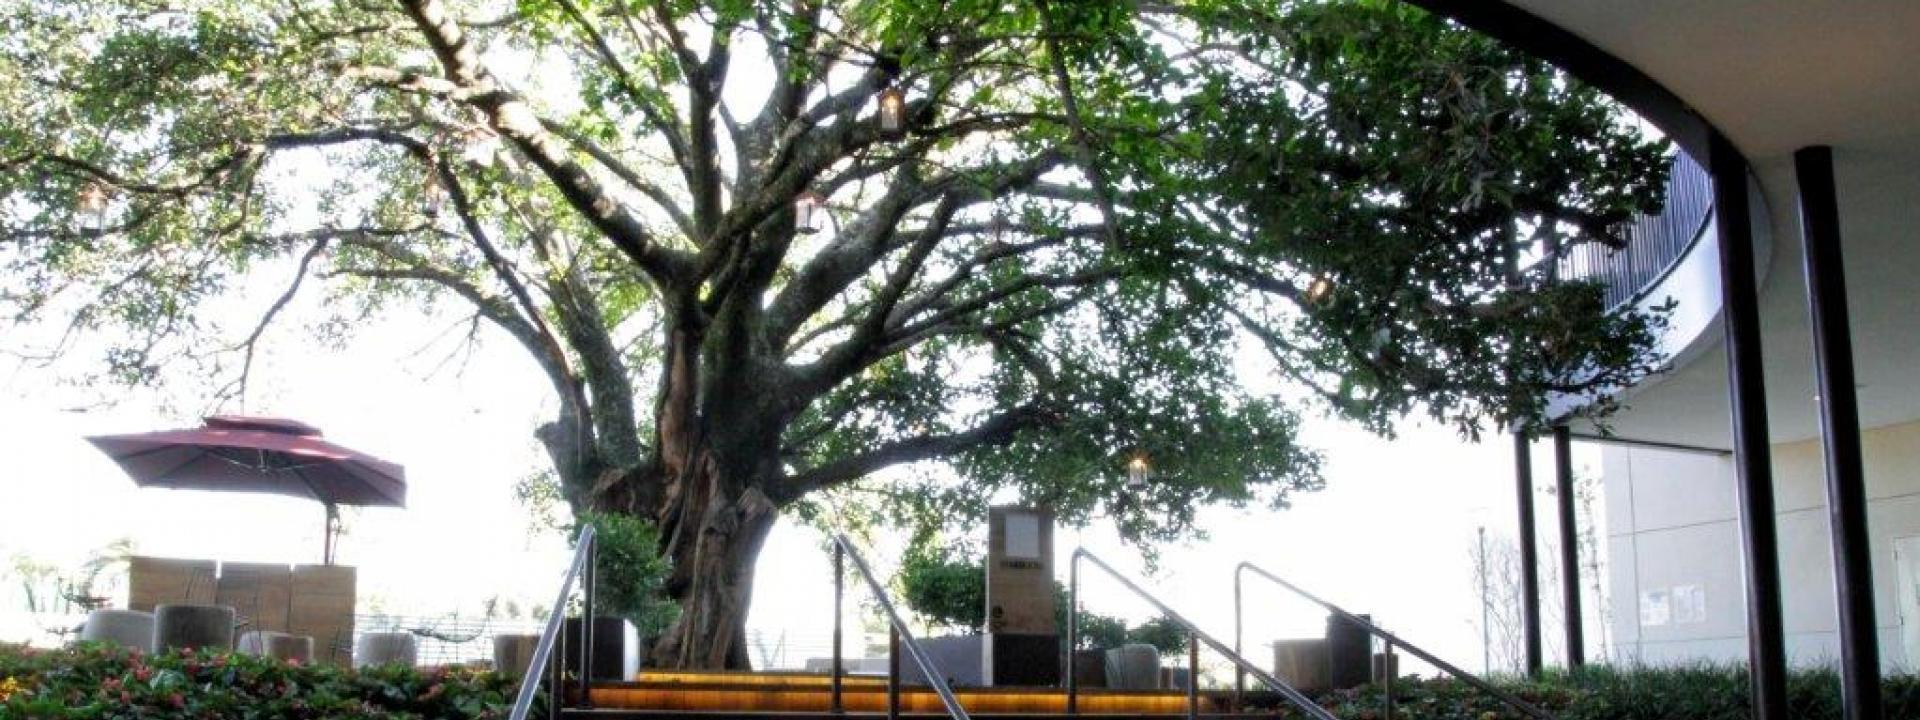 Iguatemi São José do Rio Preto  f11794dbca3